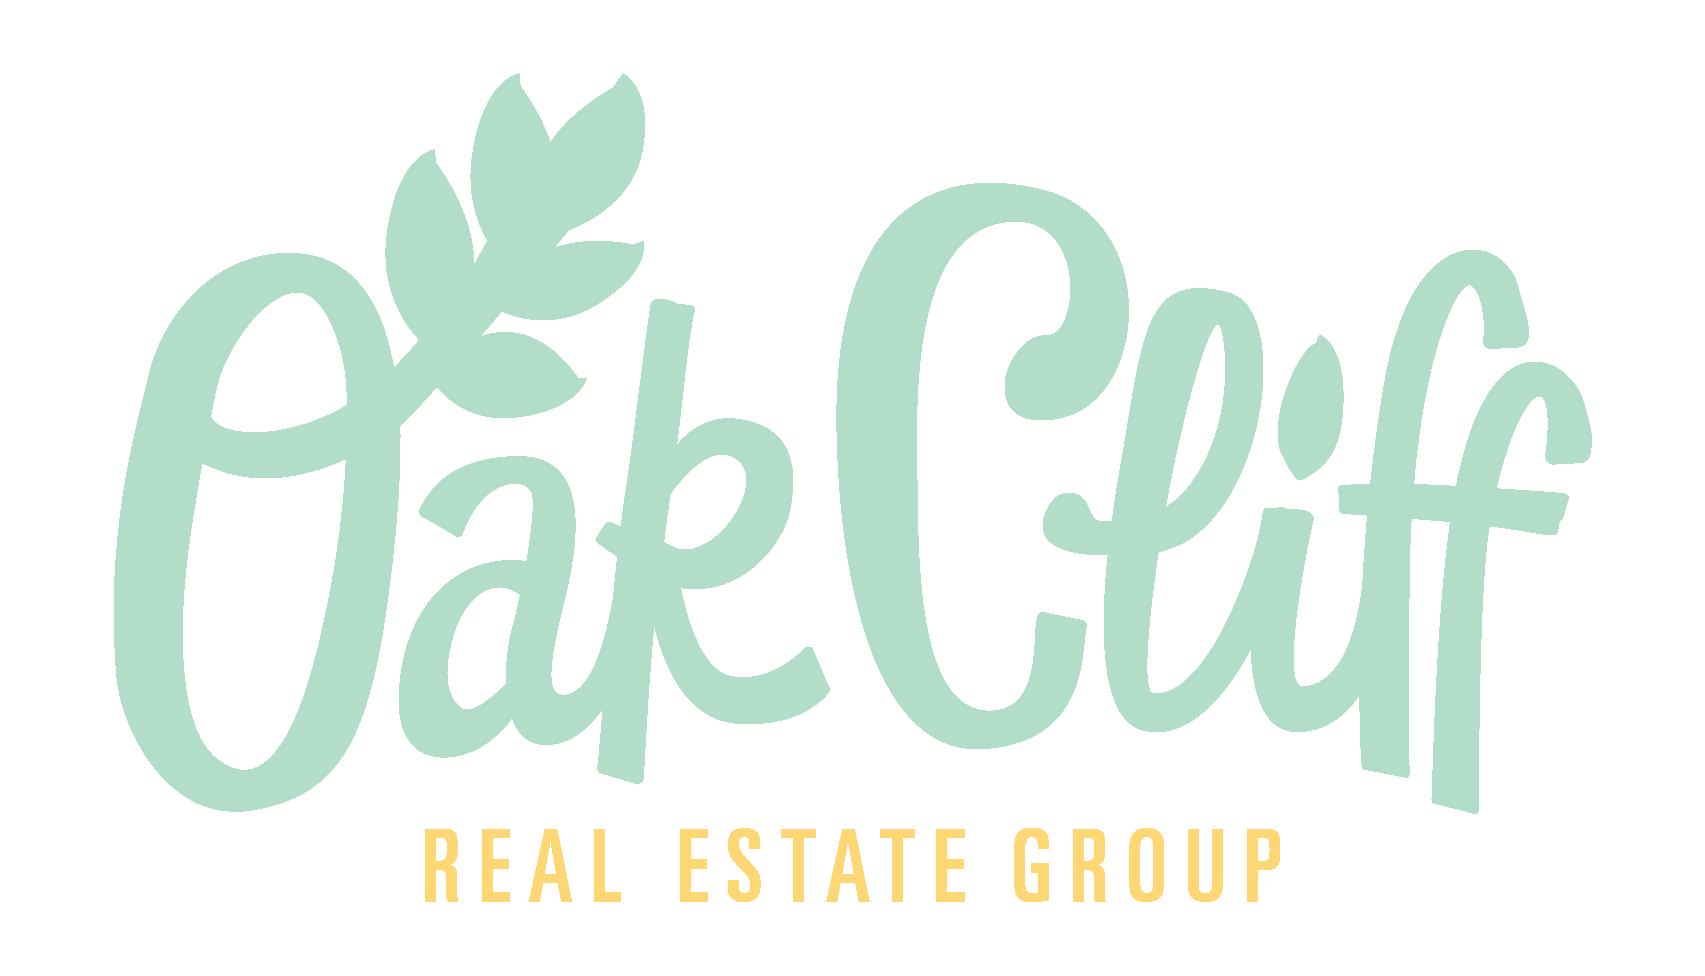 Oak Cliff Real Estate Group